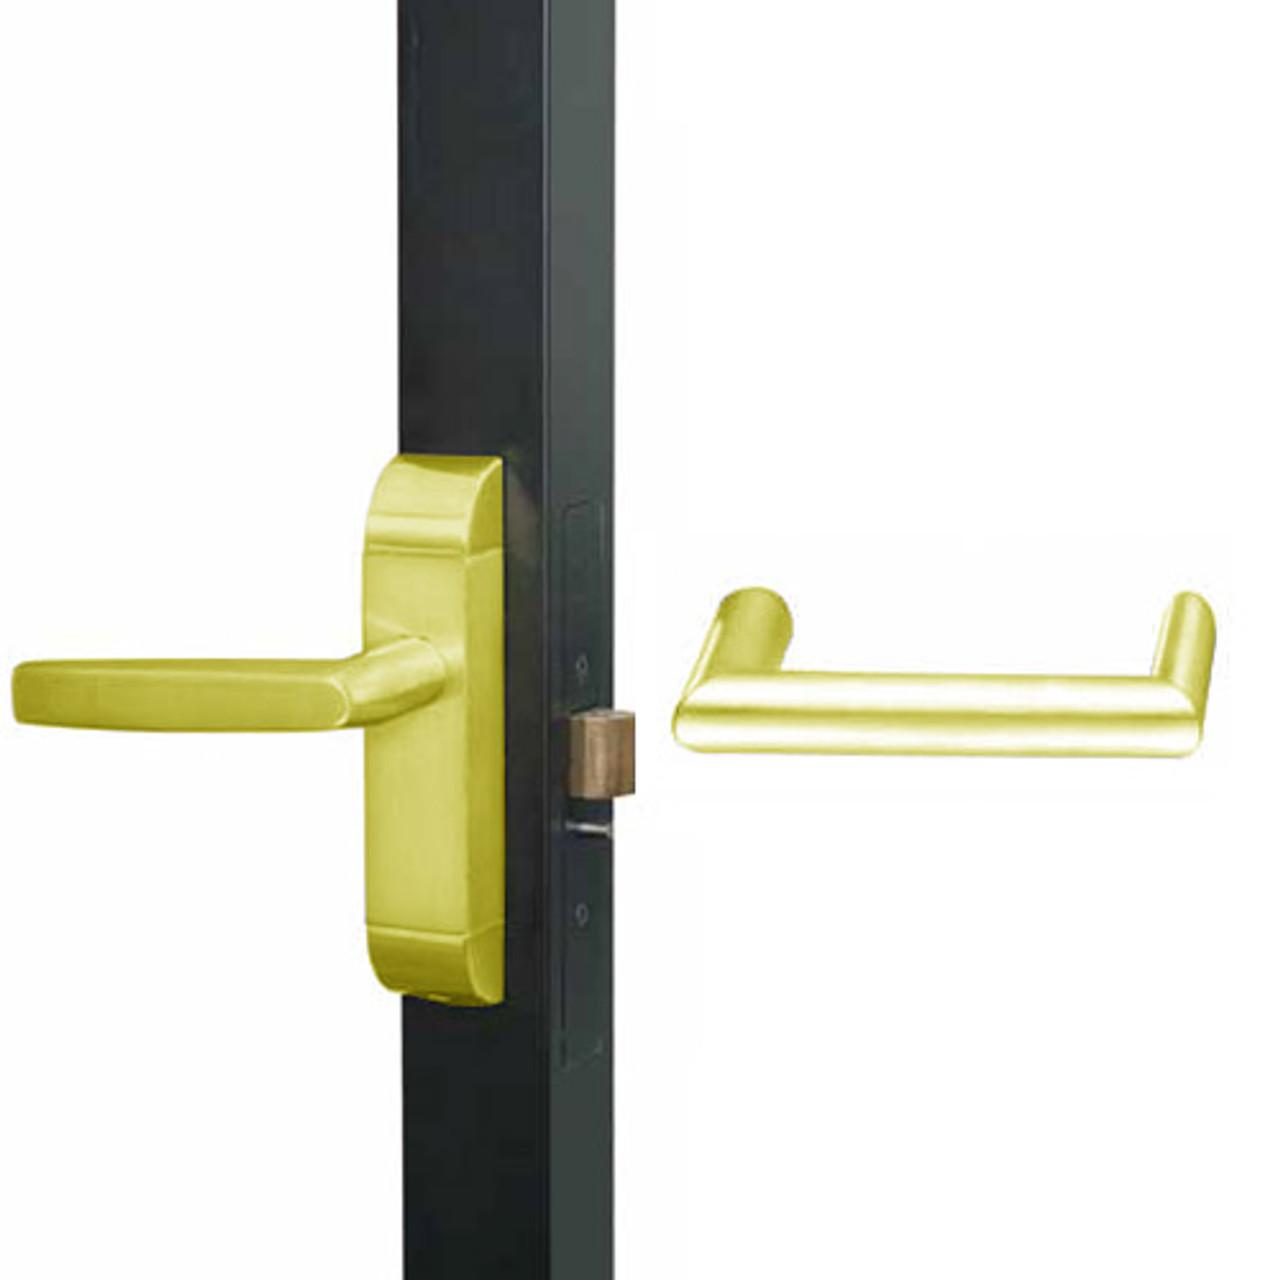 4600M-MW-531-US3 Adams Rite MW Designer Deadlatch handle in Bright Brass Finish